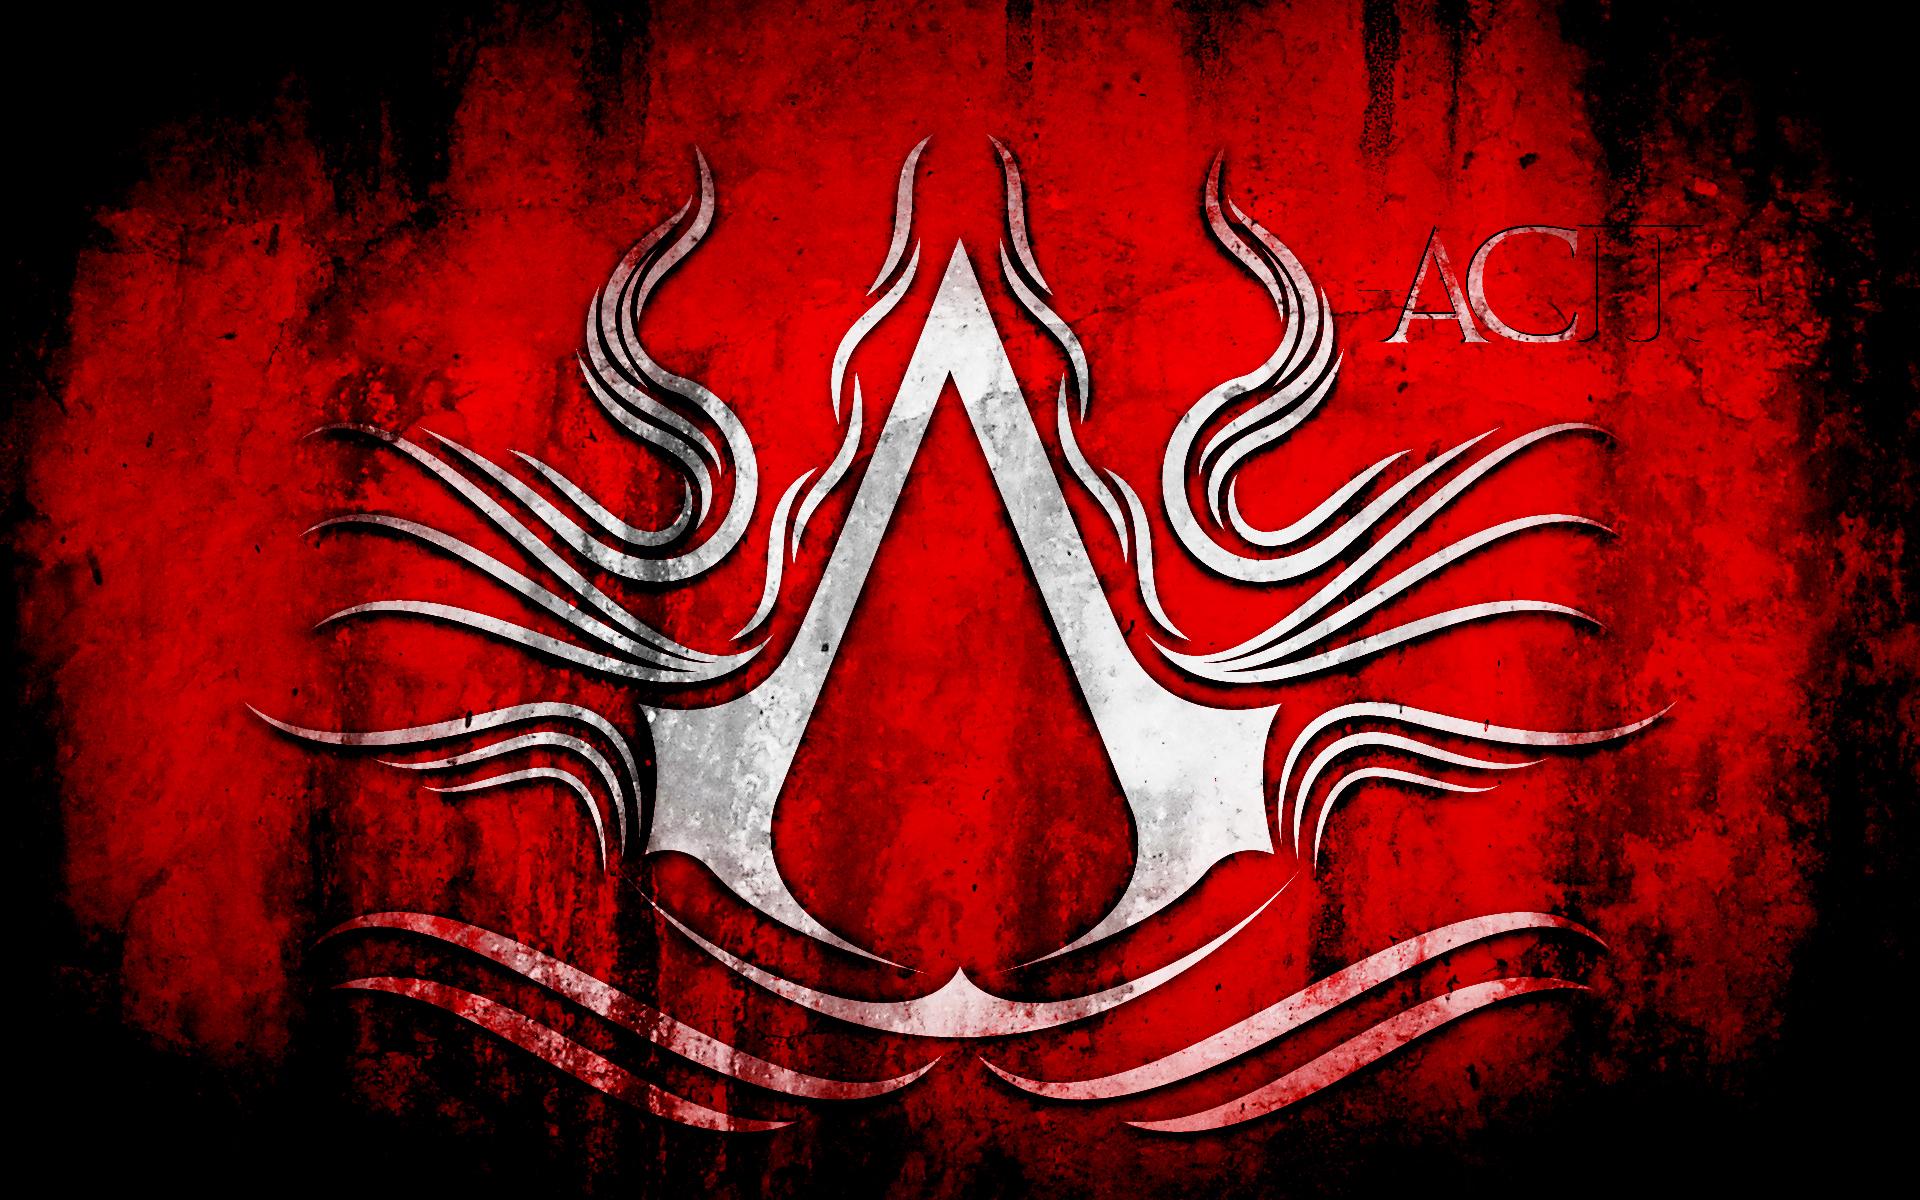 Assassins creed logo wallpaper hdpuzzles assassins creed symbol red 1920x1200